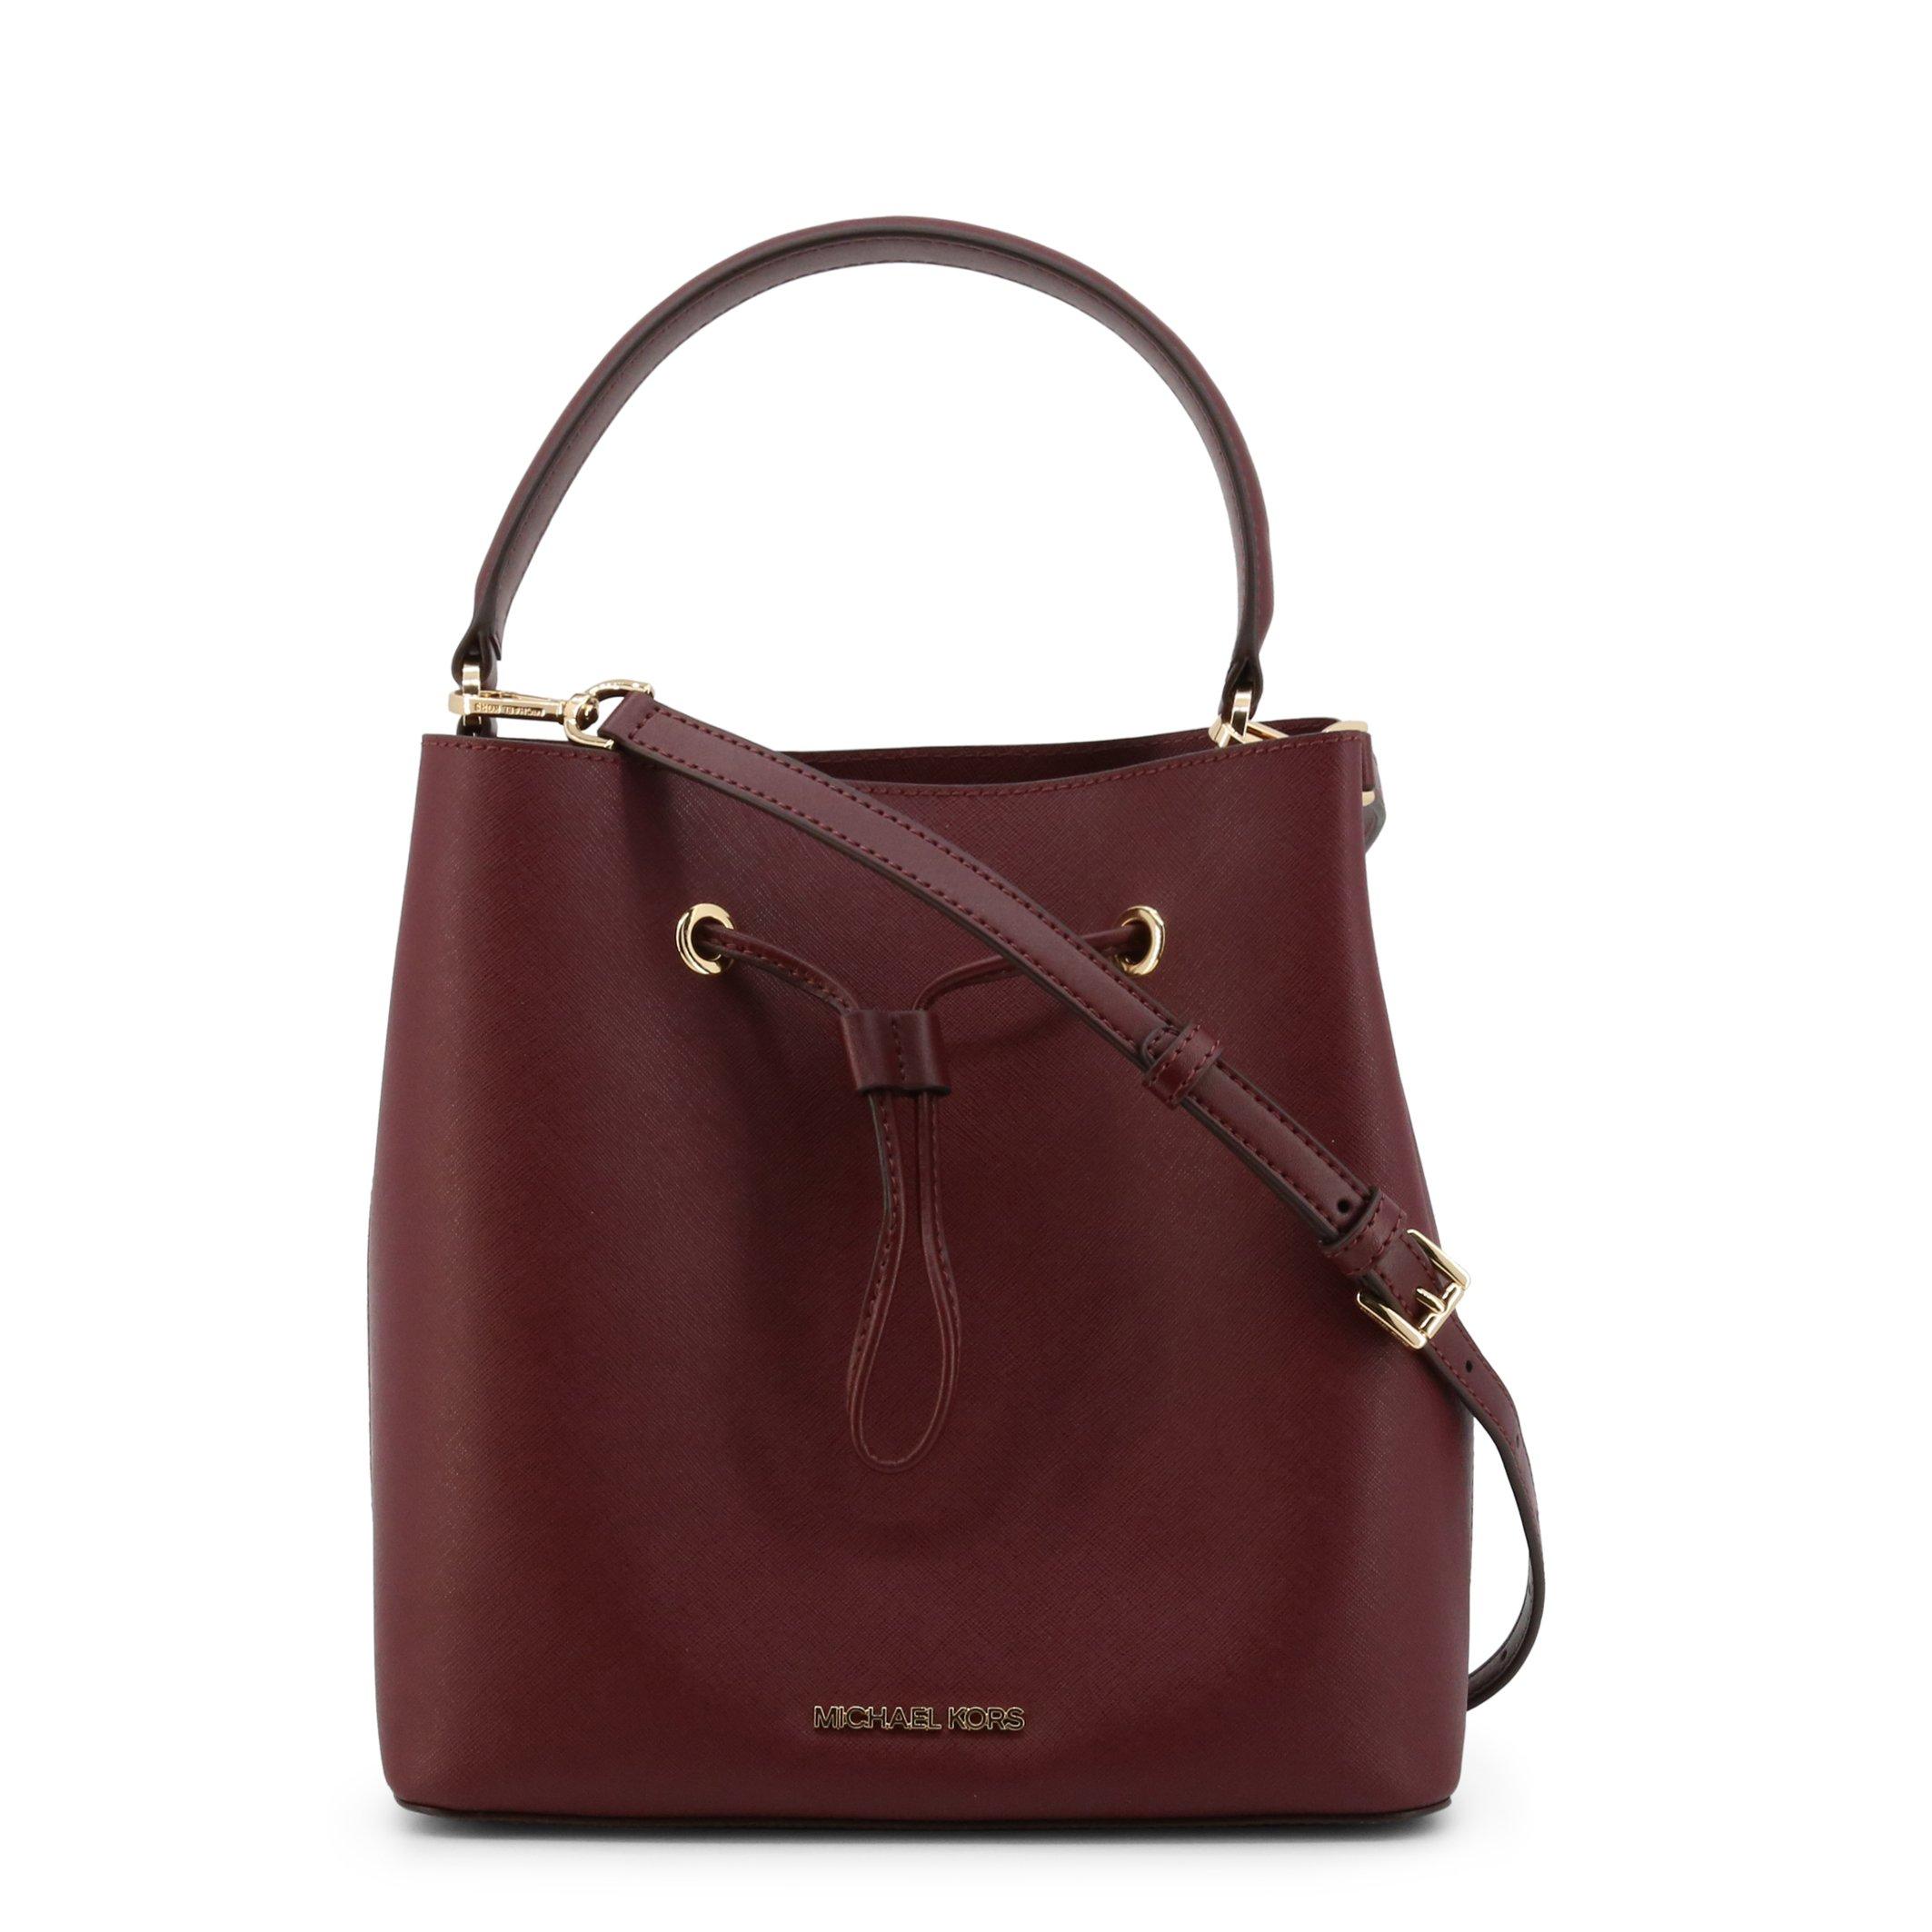 Michael Kors Women's Handbag Various Colours 346469 - red NOSIZE